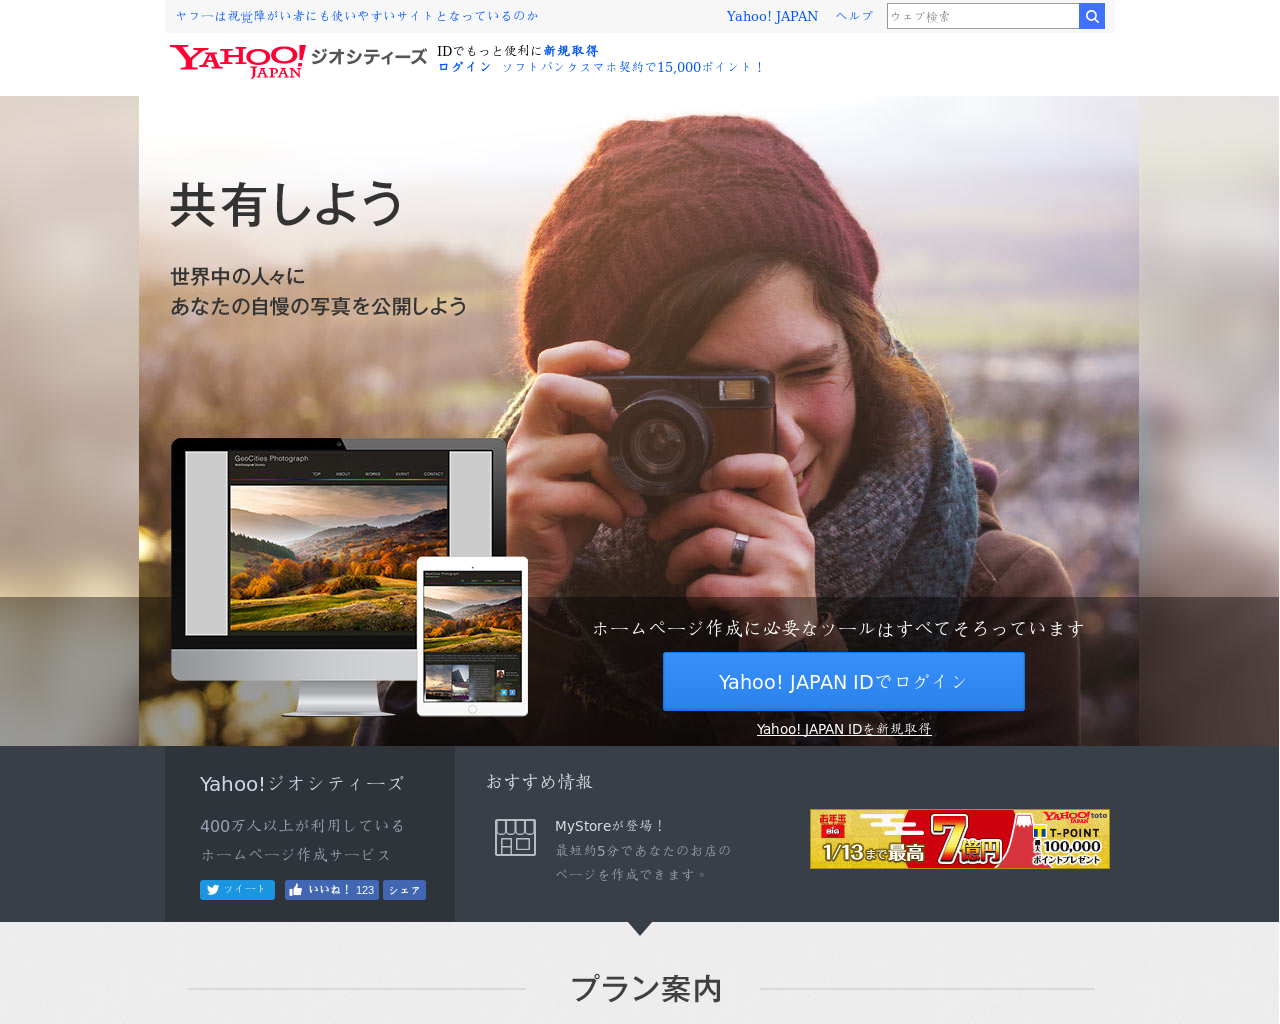 shopping.geocities.jp(2018/01/11 06:30:55)